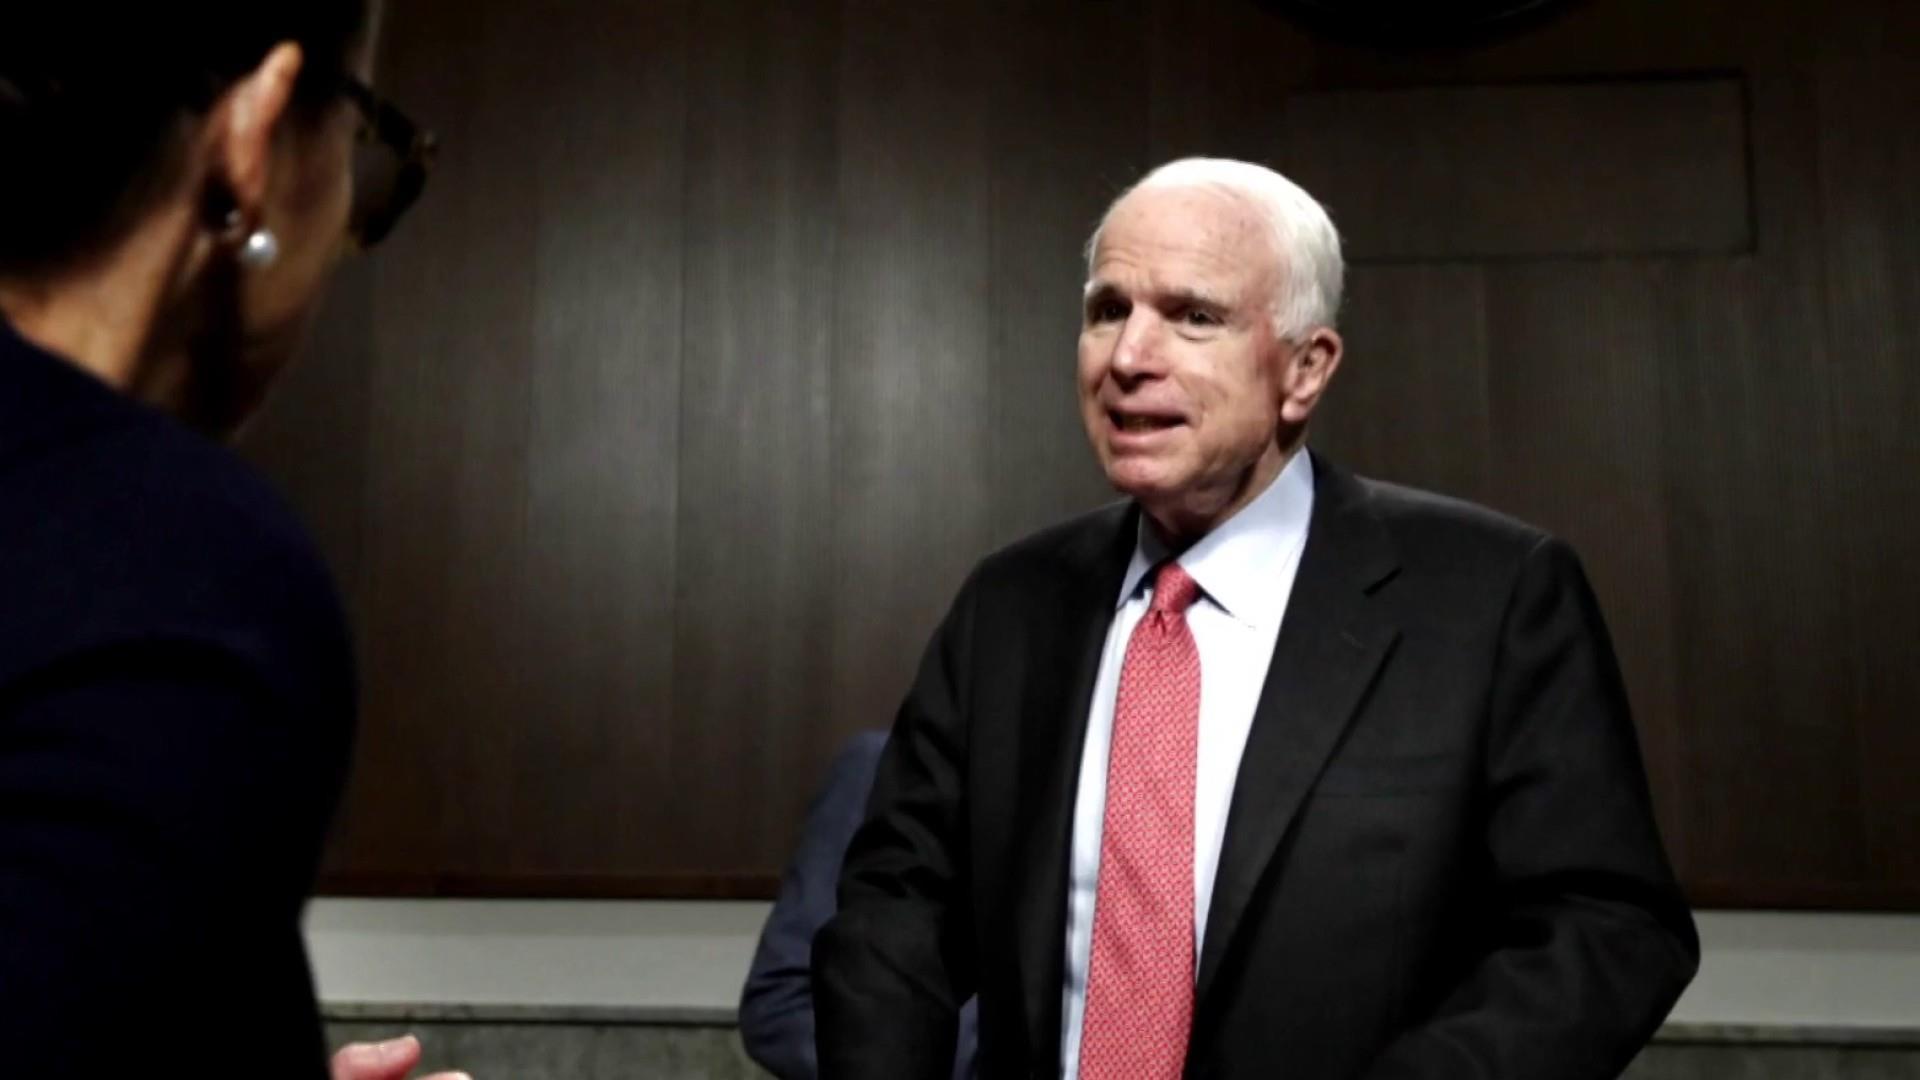 Beschloss: No other president would keep aide after McCain remark